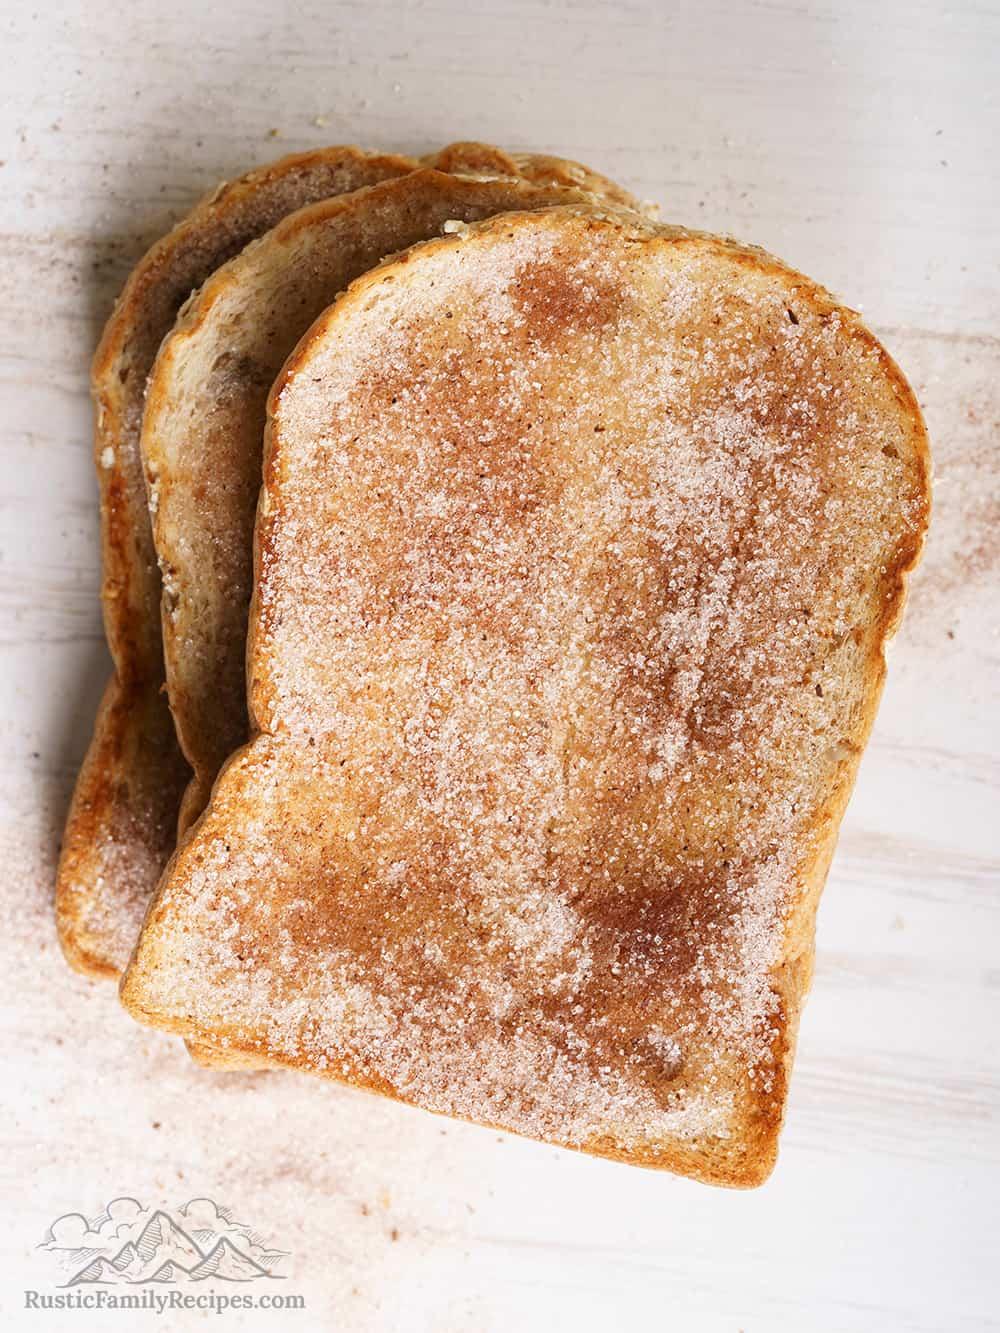 Cinnamon sugar toast slices on a counter